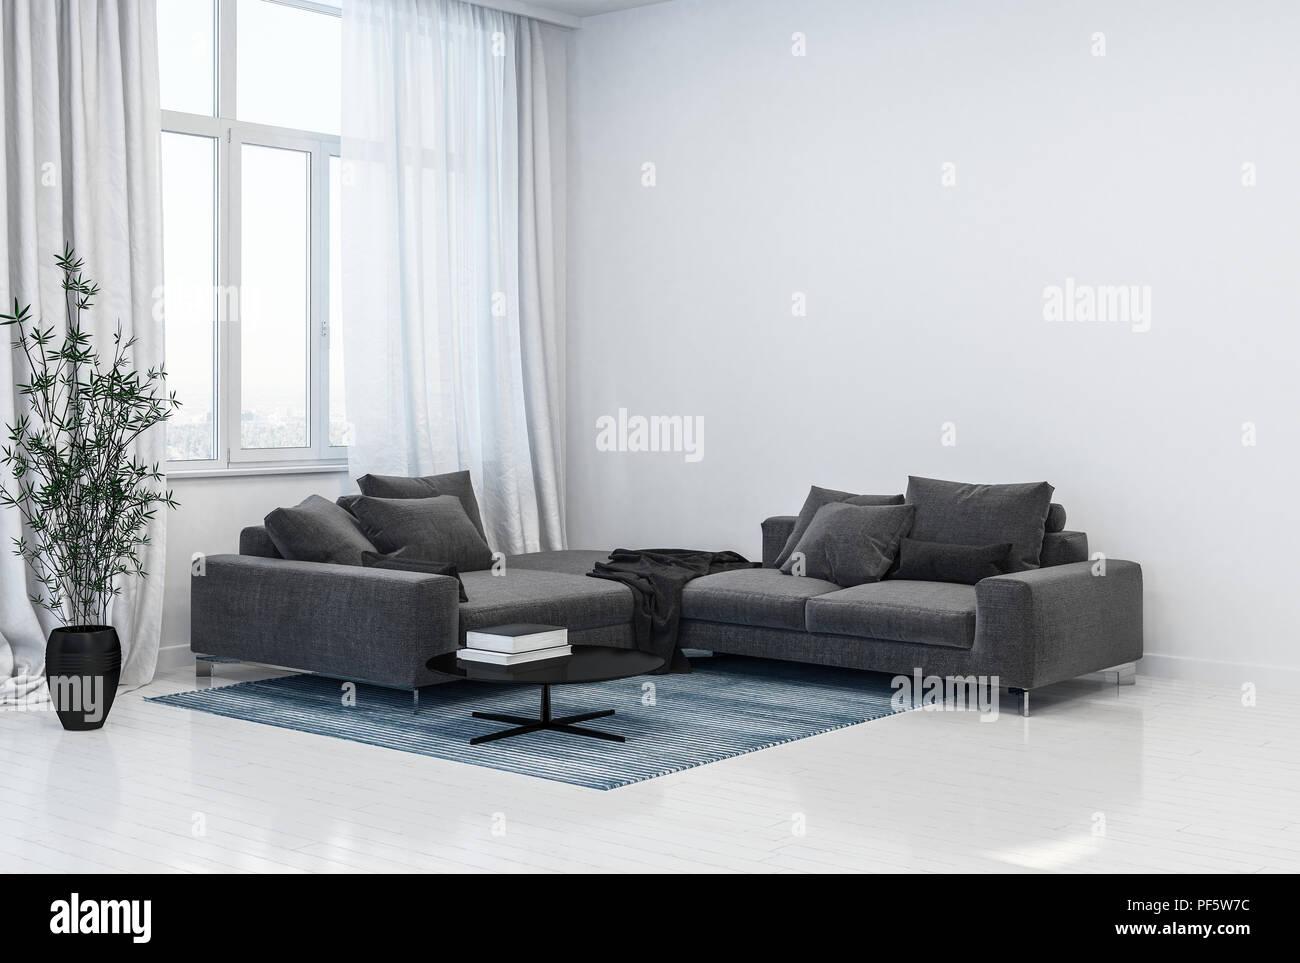 monochromatic grey and white